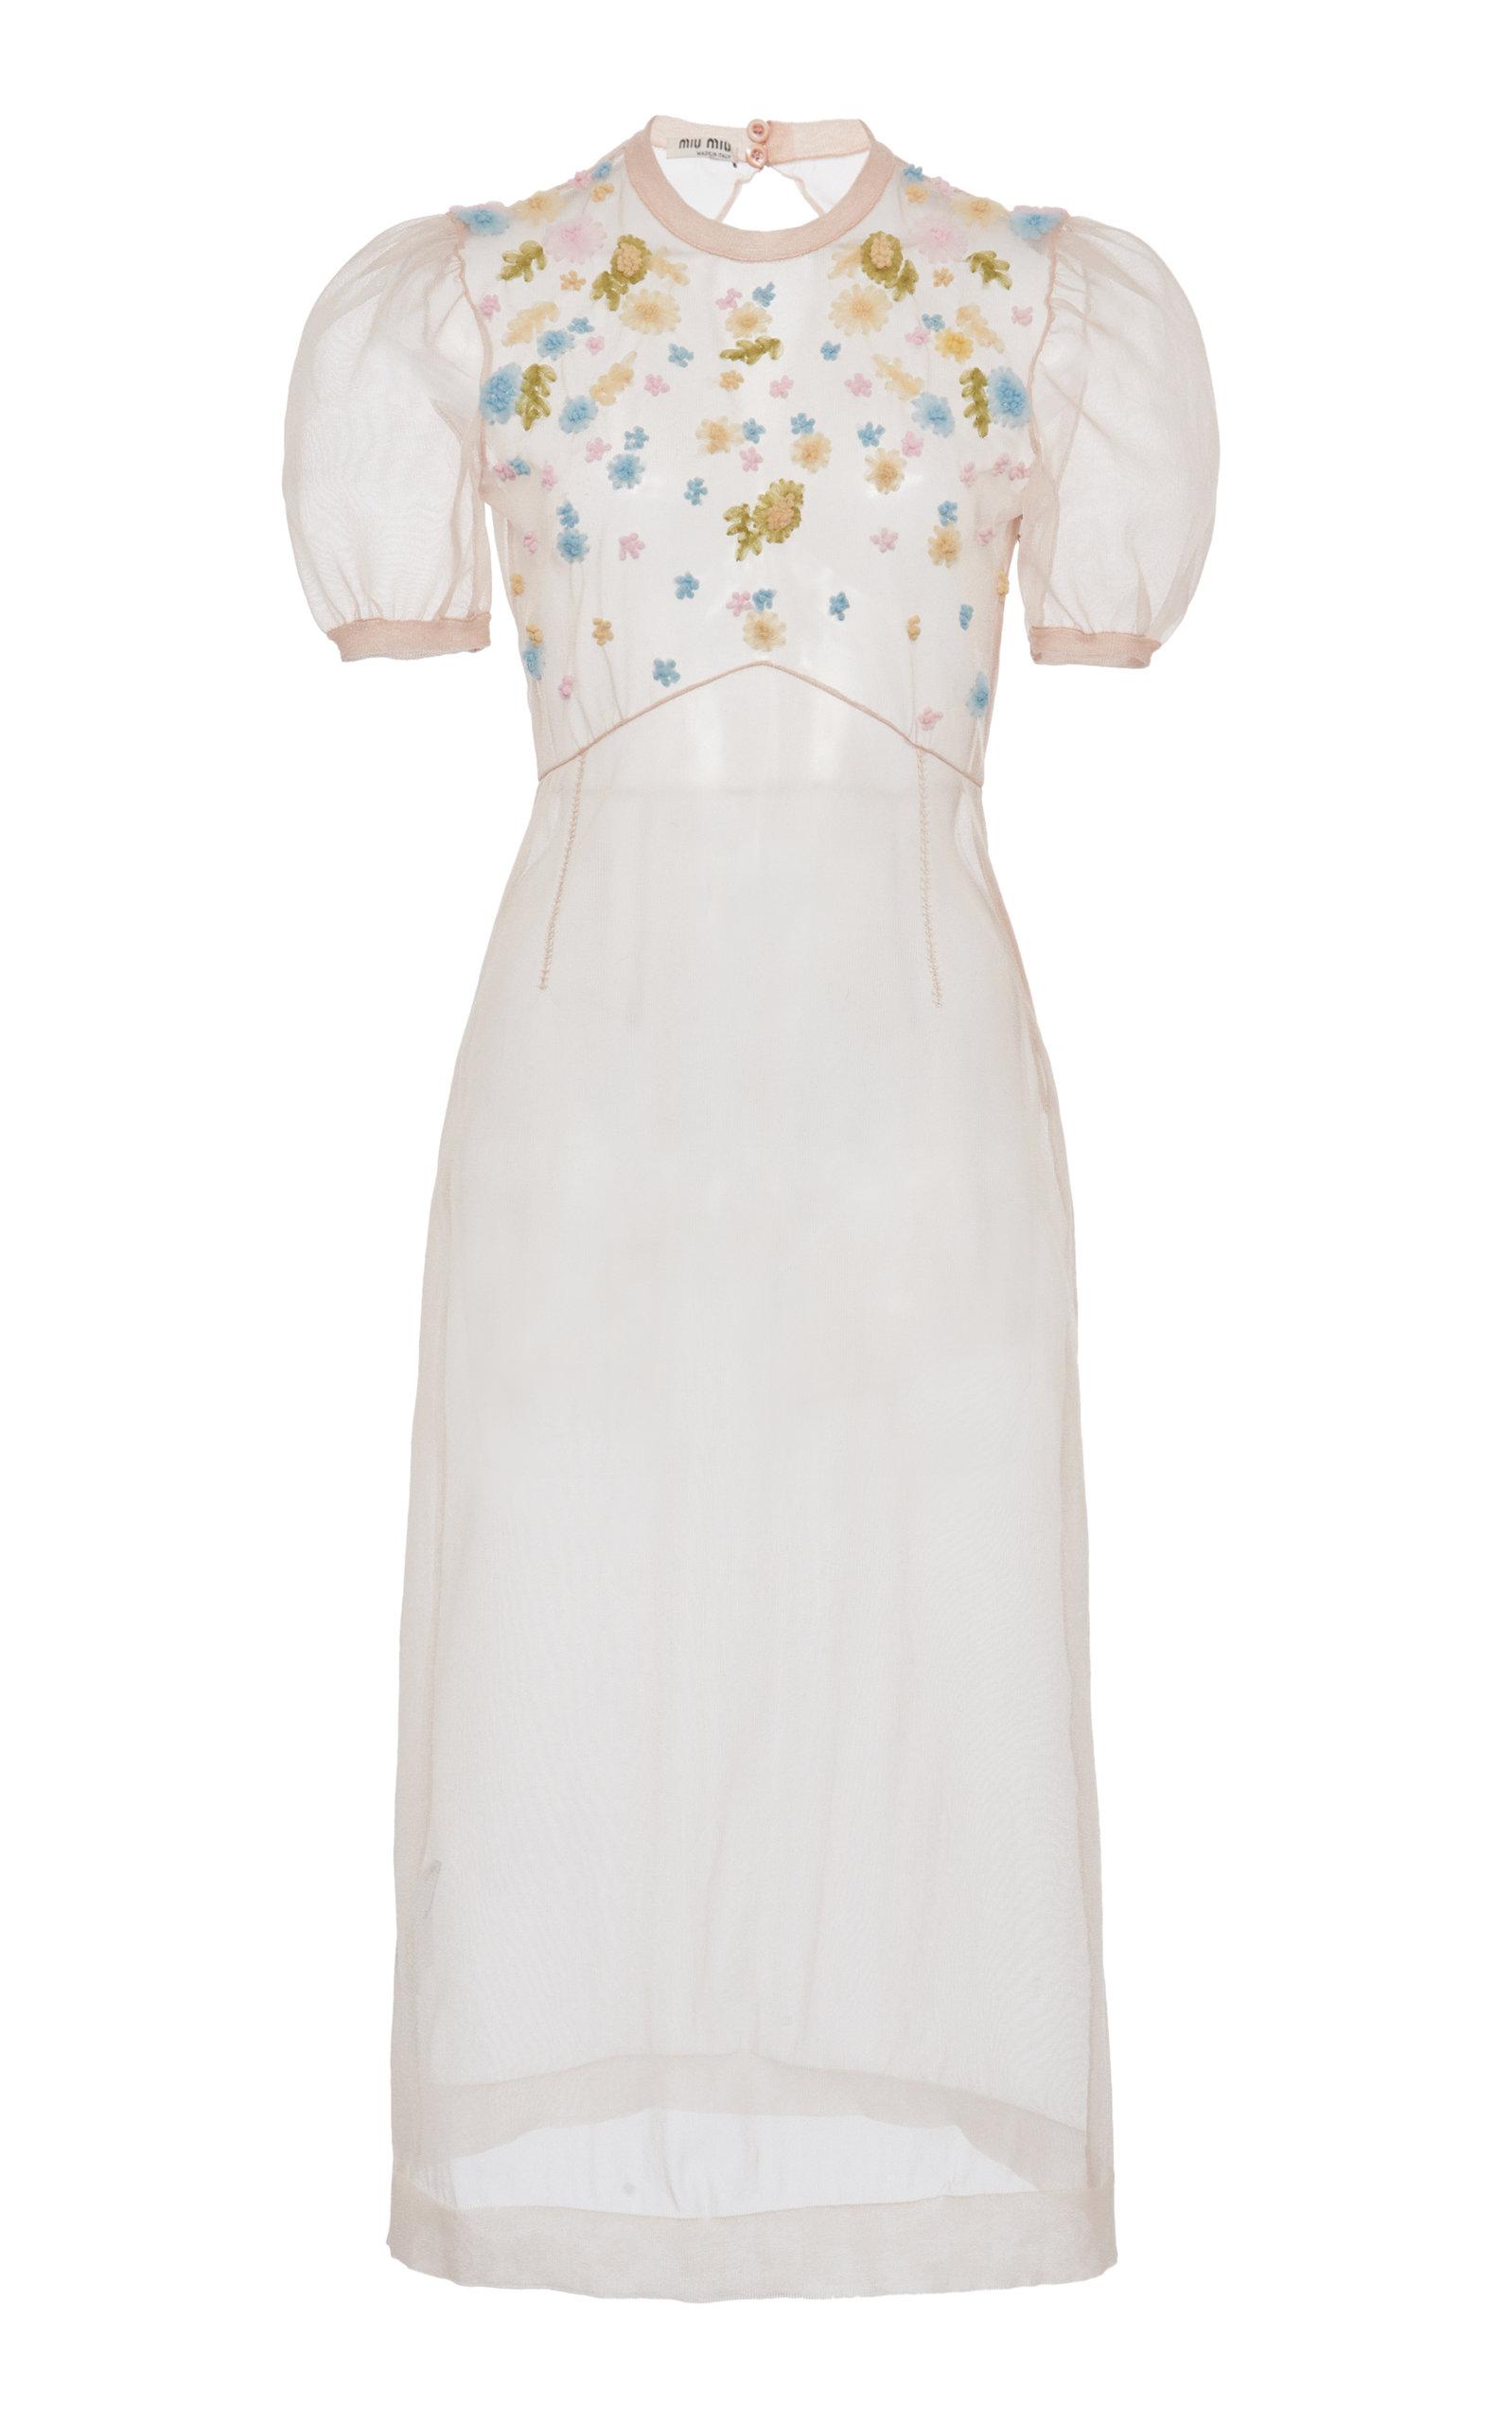 Buy Miu Miu Sheer Organza Short Sleeve Dress online, shop Miu Miu at the best price